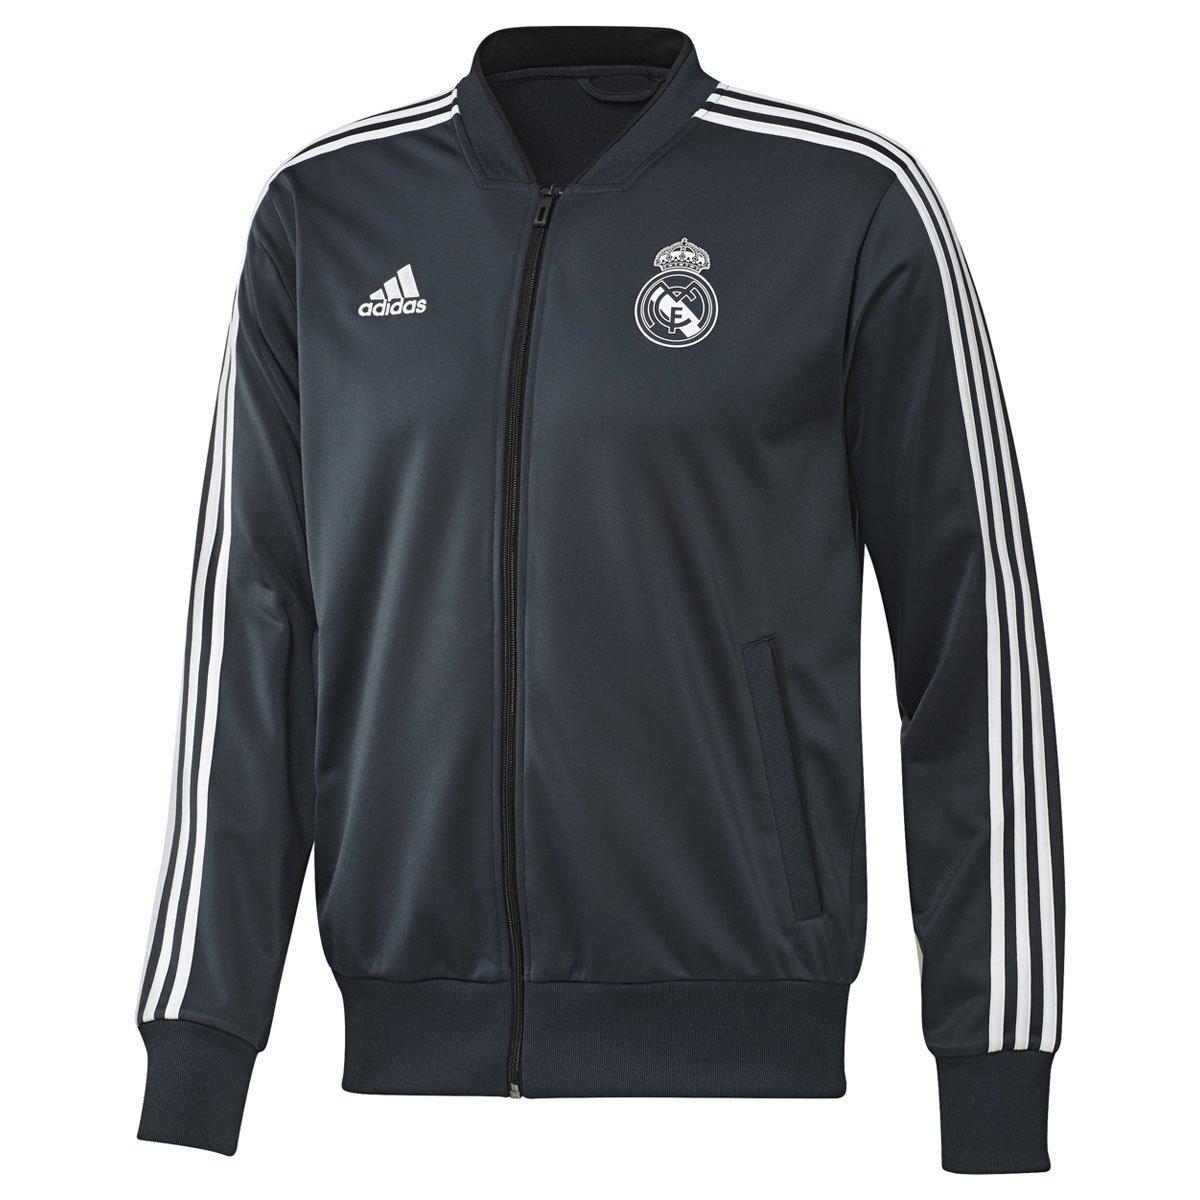 20111b59d Conjunto deportivo real madrid 18/19 adidas - caballero